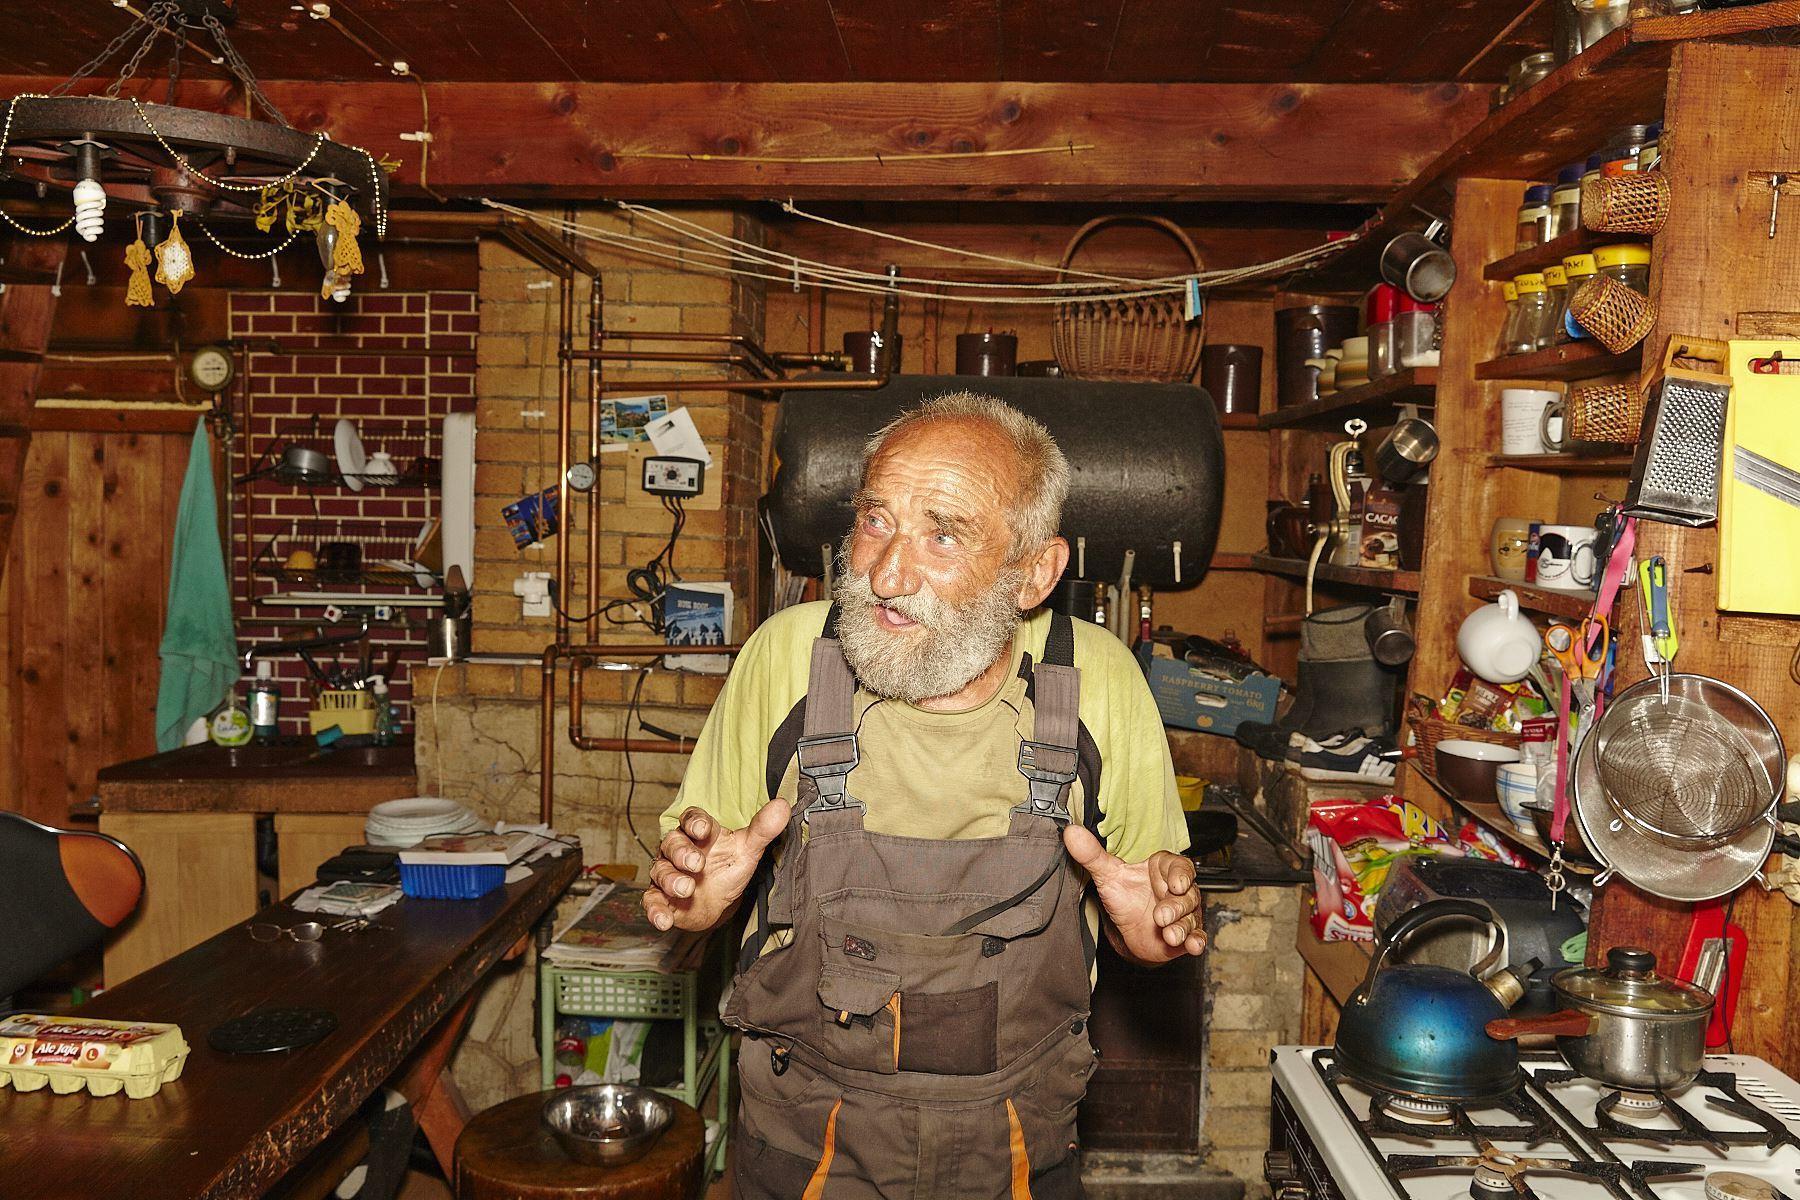 Krzysztof Bross Famile U Freunde Sanna 09082015 Nikolai